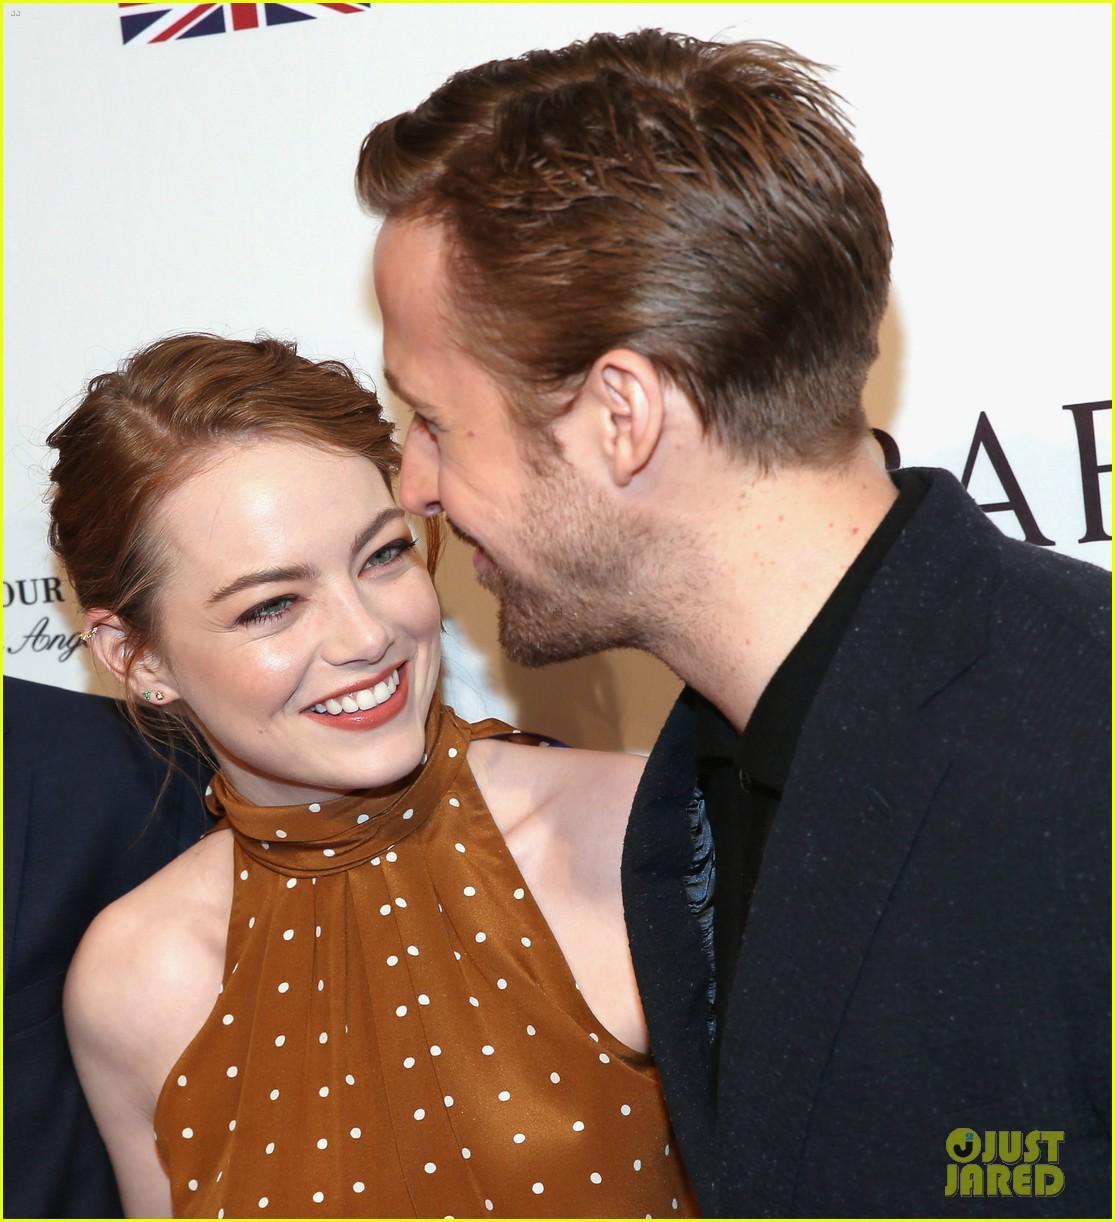 brad pitt and kate hudson dating